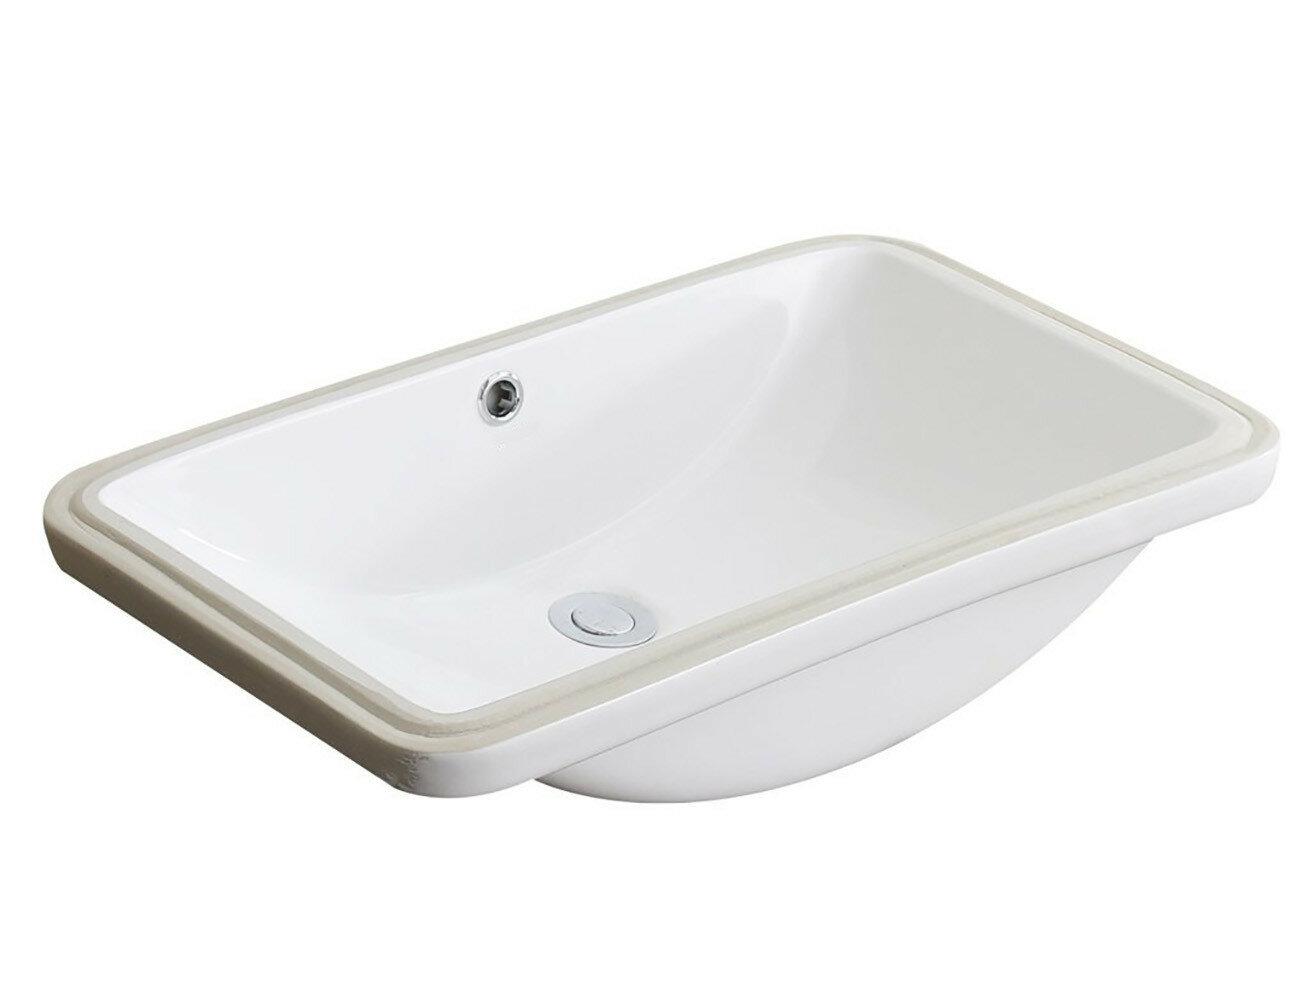 Anzzi Lanmia Series Vitreous China Rectangular Undermount Bathroom Sink With Overflow Wayfair